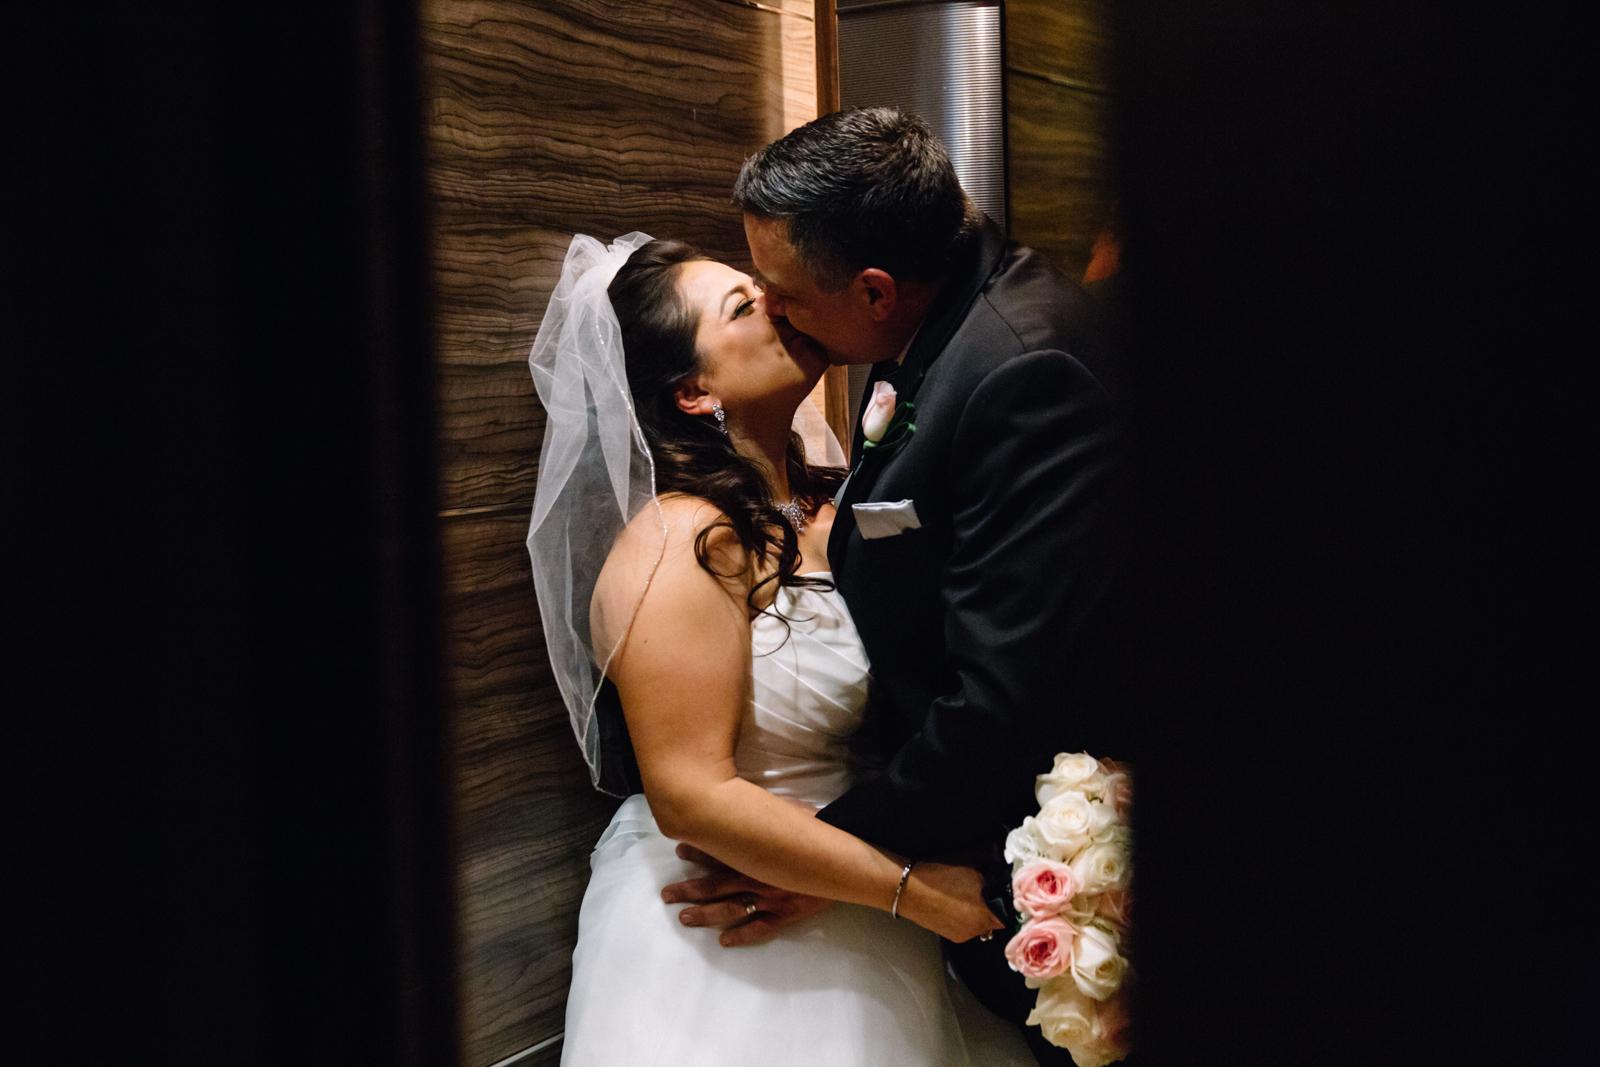 #weddingplannerlasvegas,#lasvegasweddingcoordinators,#weddingcoordinatorslasvegas,#weddingcoordinatorlasvegas,#lasvegasweddingplanner #desirableeventsbydesi #Tropicanawedding #wedding, #love, #lovewins, #samesexwedding, #gaywedding, #tropicana, #lasvegaswedding, #weddinglasvegas, #weddingplannerslasvegas, #lasvegasweddingplanners, #mresortwedding, #susieandwill, #nyewedding, #blacktiewedding, #newyearseve, #newyearsevewedding, #suitewedding, #lasvegasnewyearseve, #weddingsbydesi, #bydzign